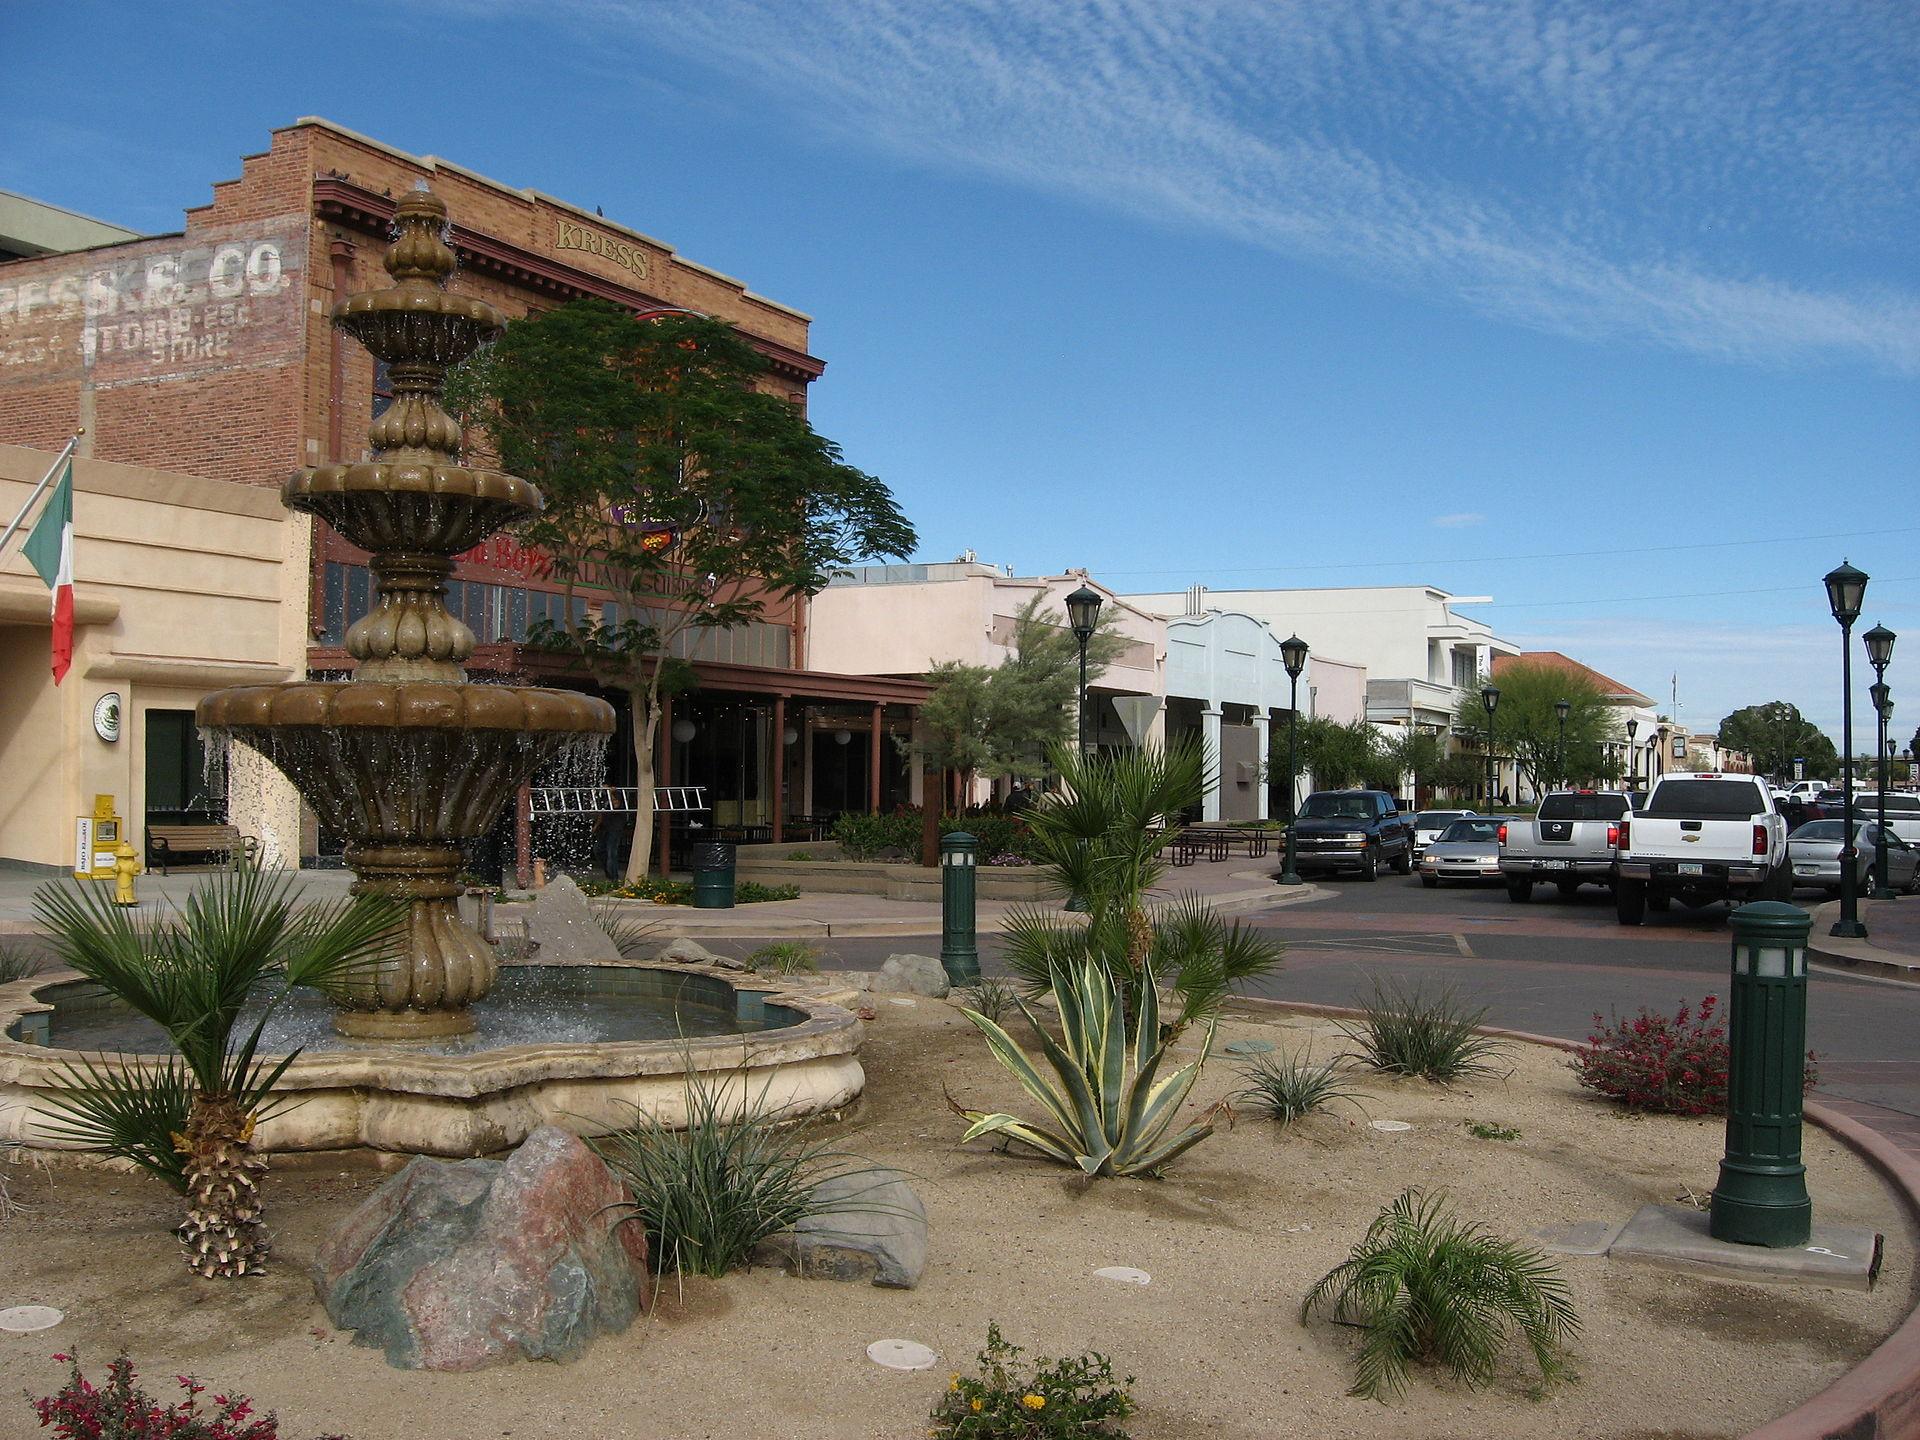 Downtown_Yuma_Arizona_(3)